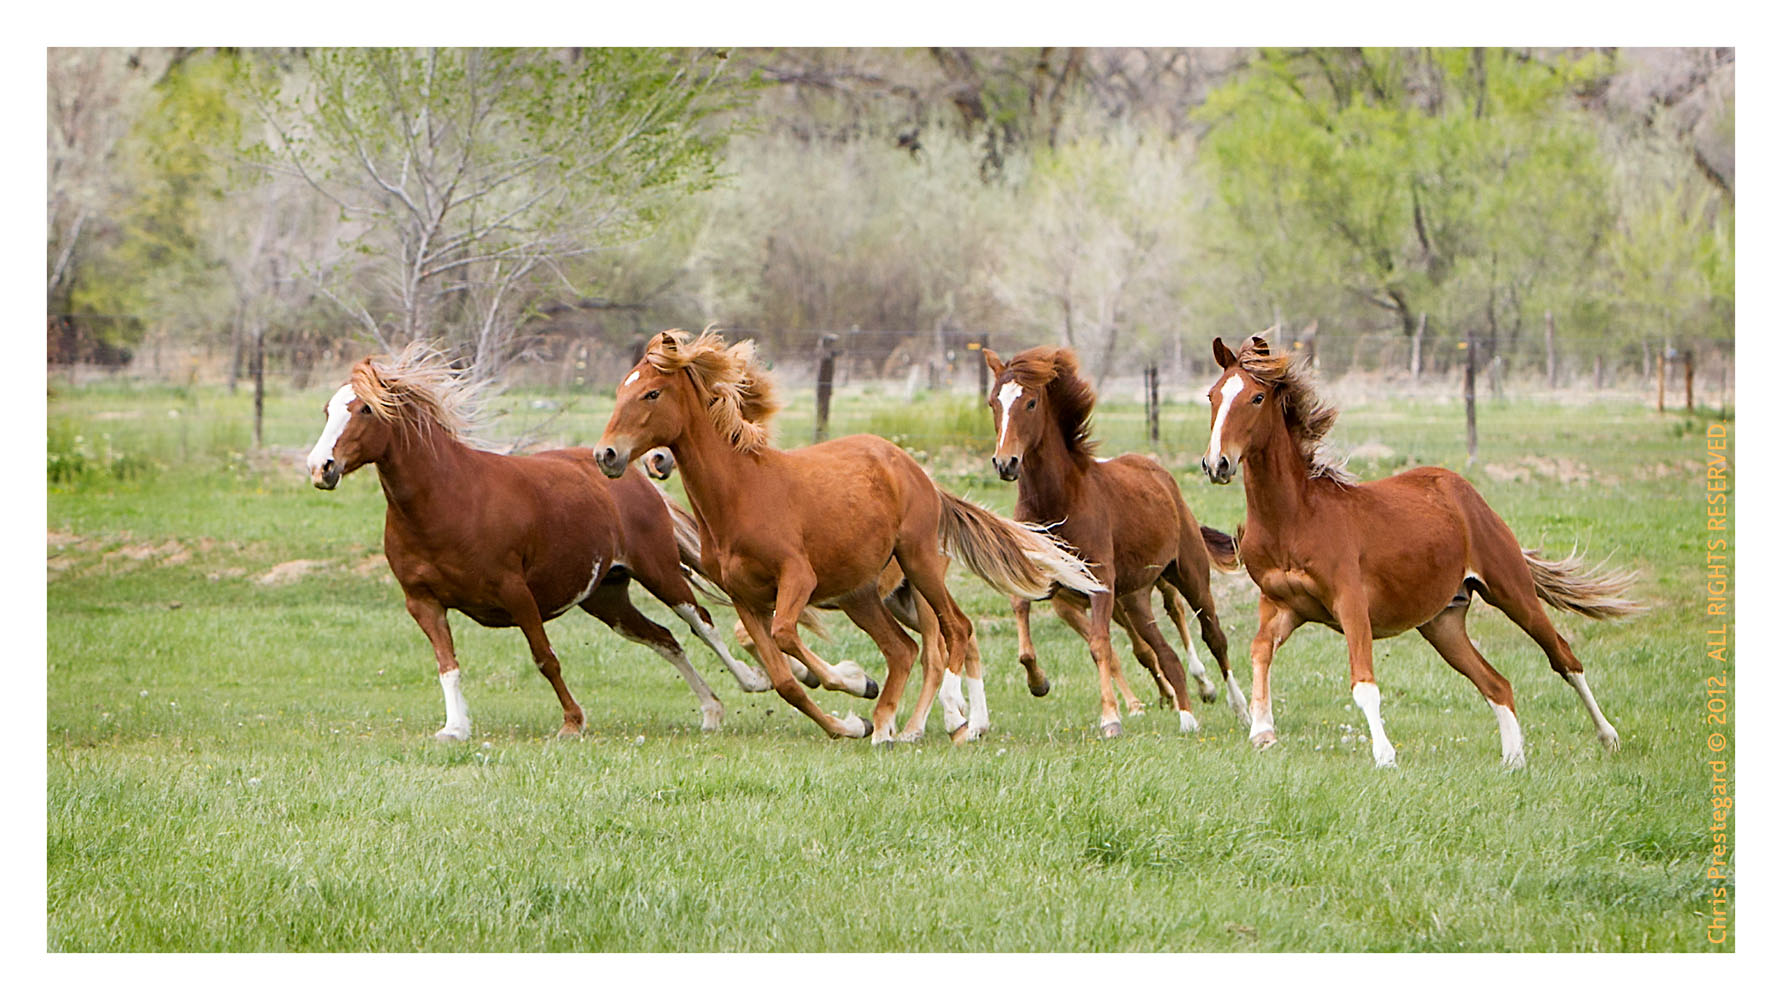 Horse3348-Feb11-2012